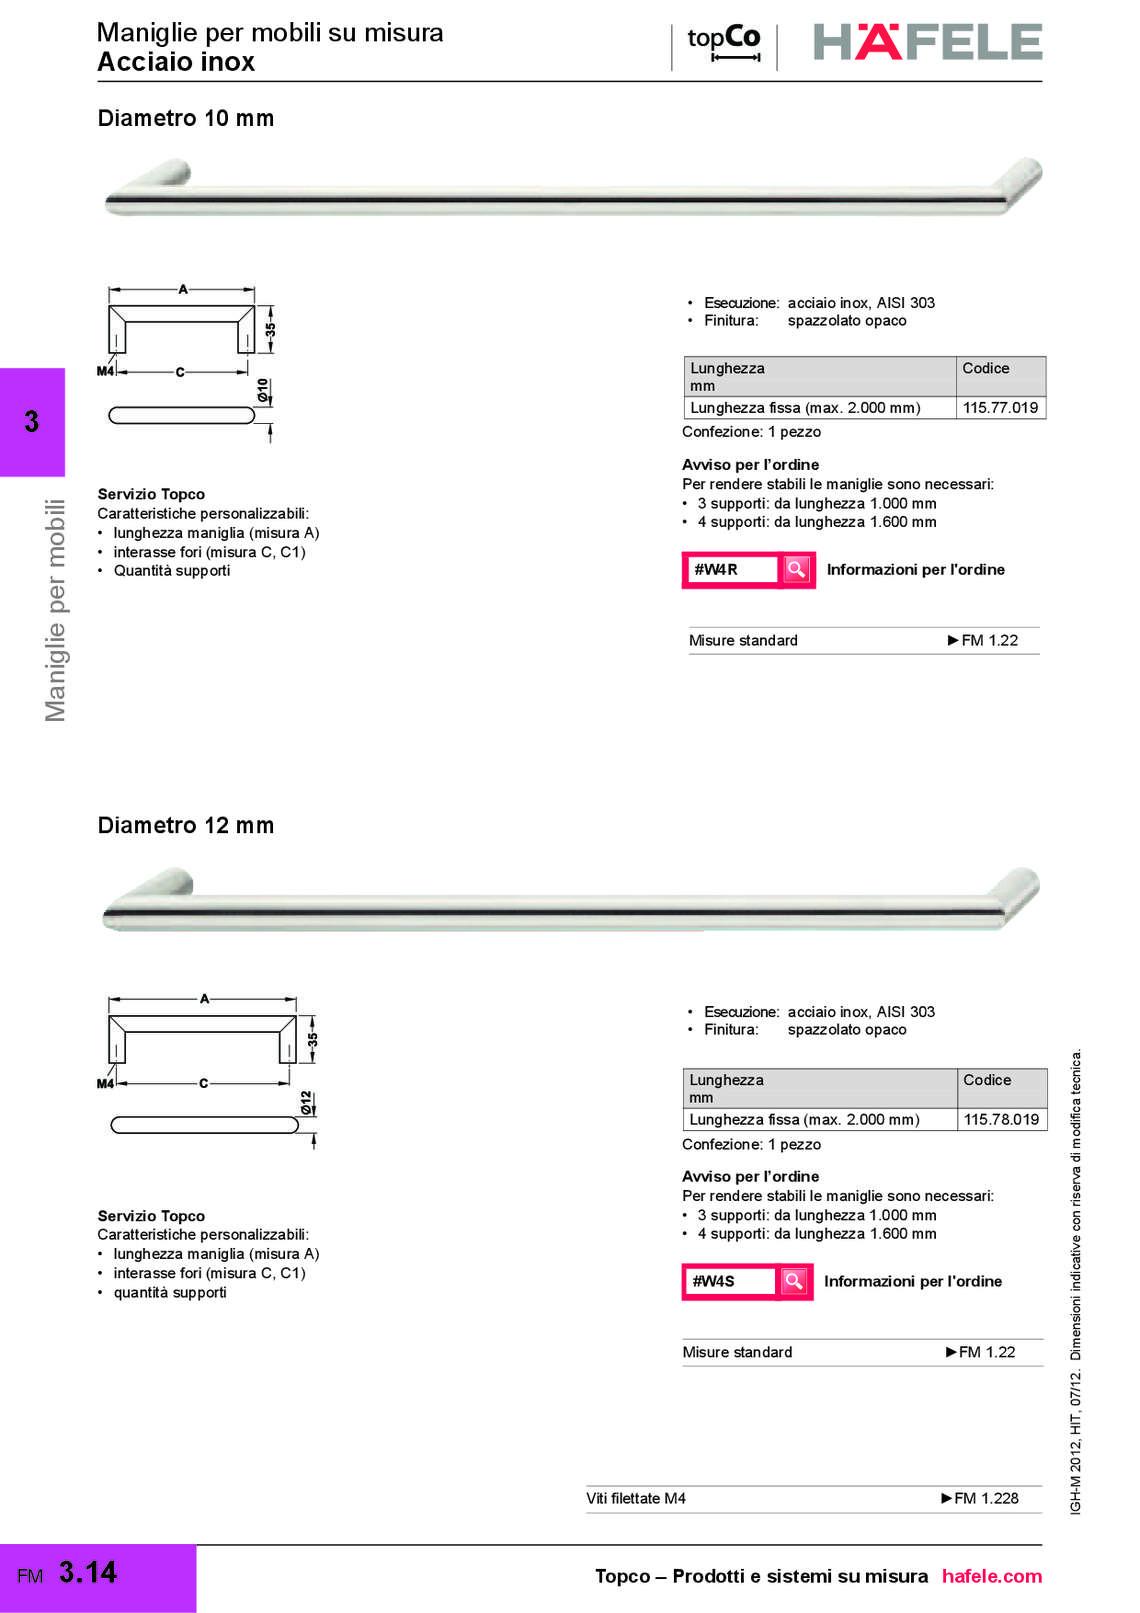 hafele-prodotti-su-misura_81_023.jpg